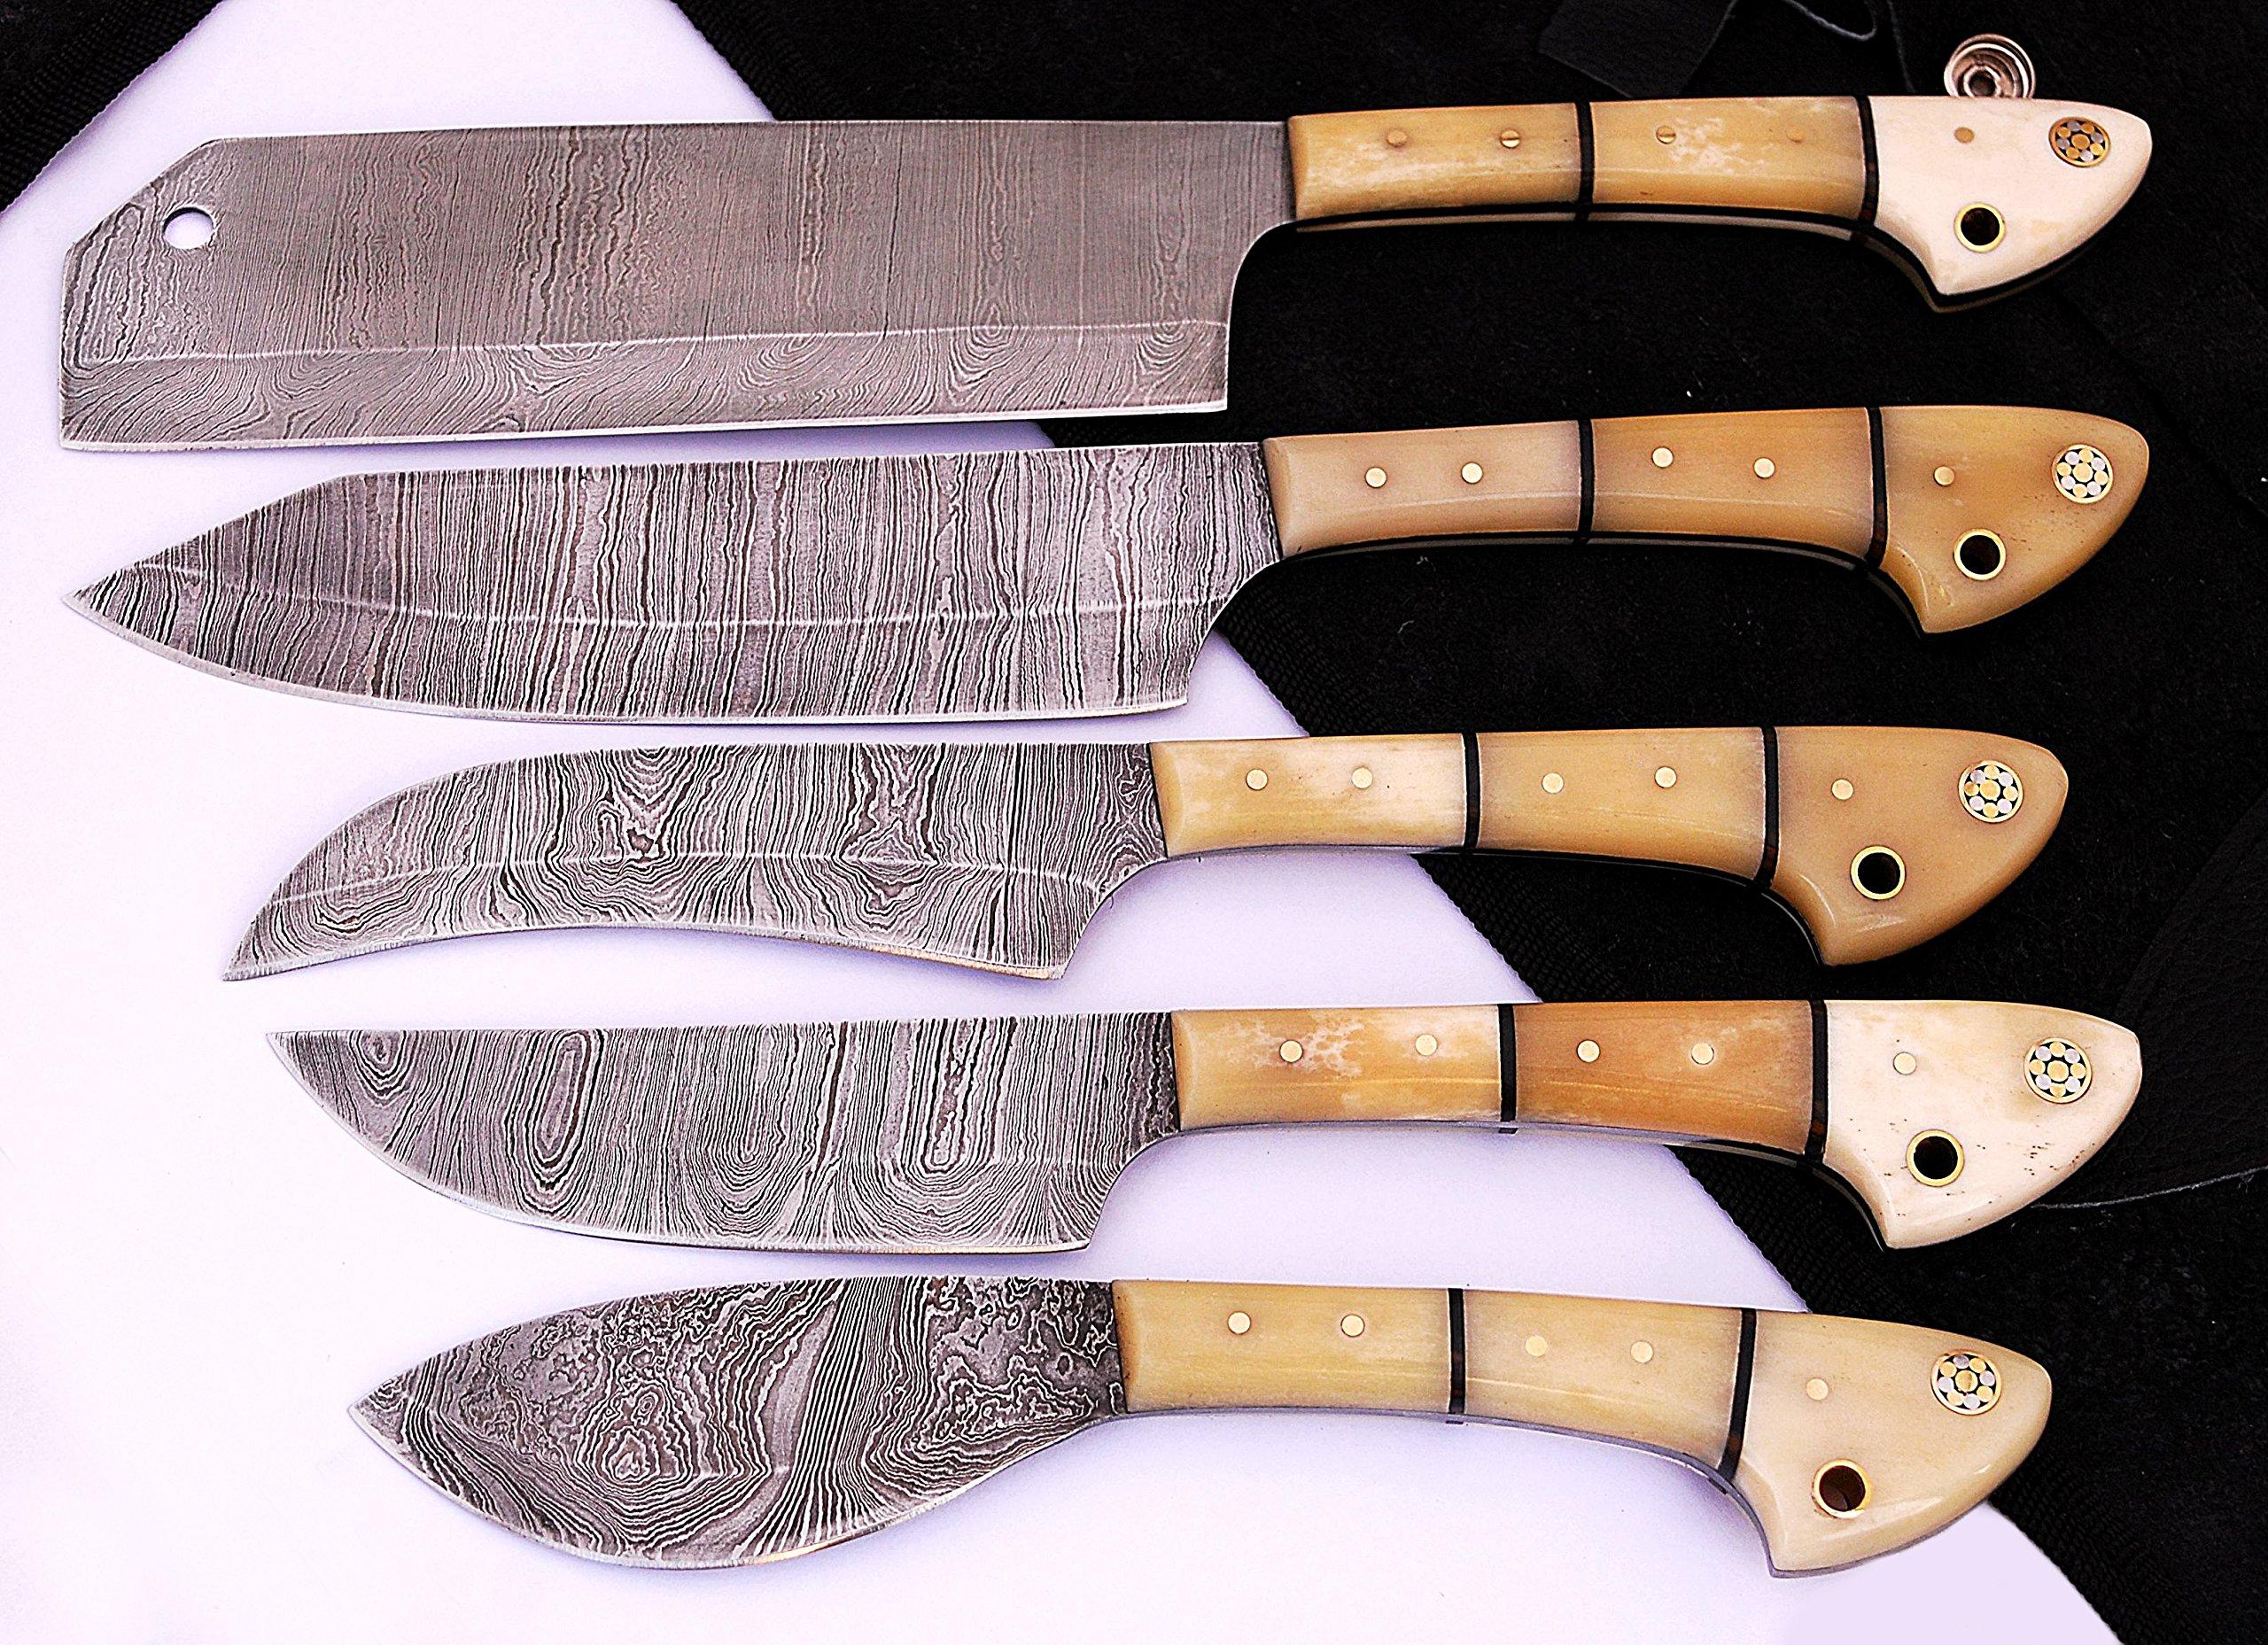 1033BW Custom Made Damascus Steel 5 pcs Professional Kitchen Chef Knife Set with 5 Pocket Case Chef Knife Roll Bag by GladiatorsGuild (Bone White)